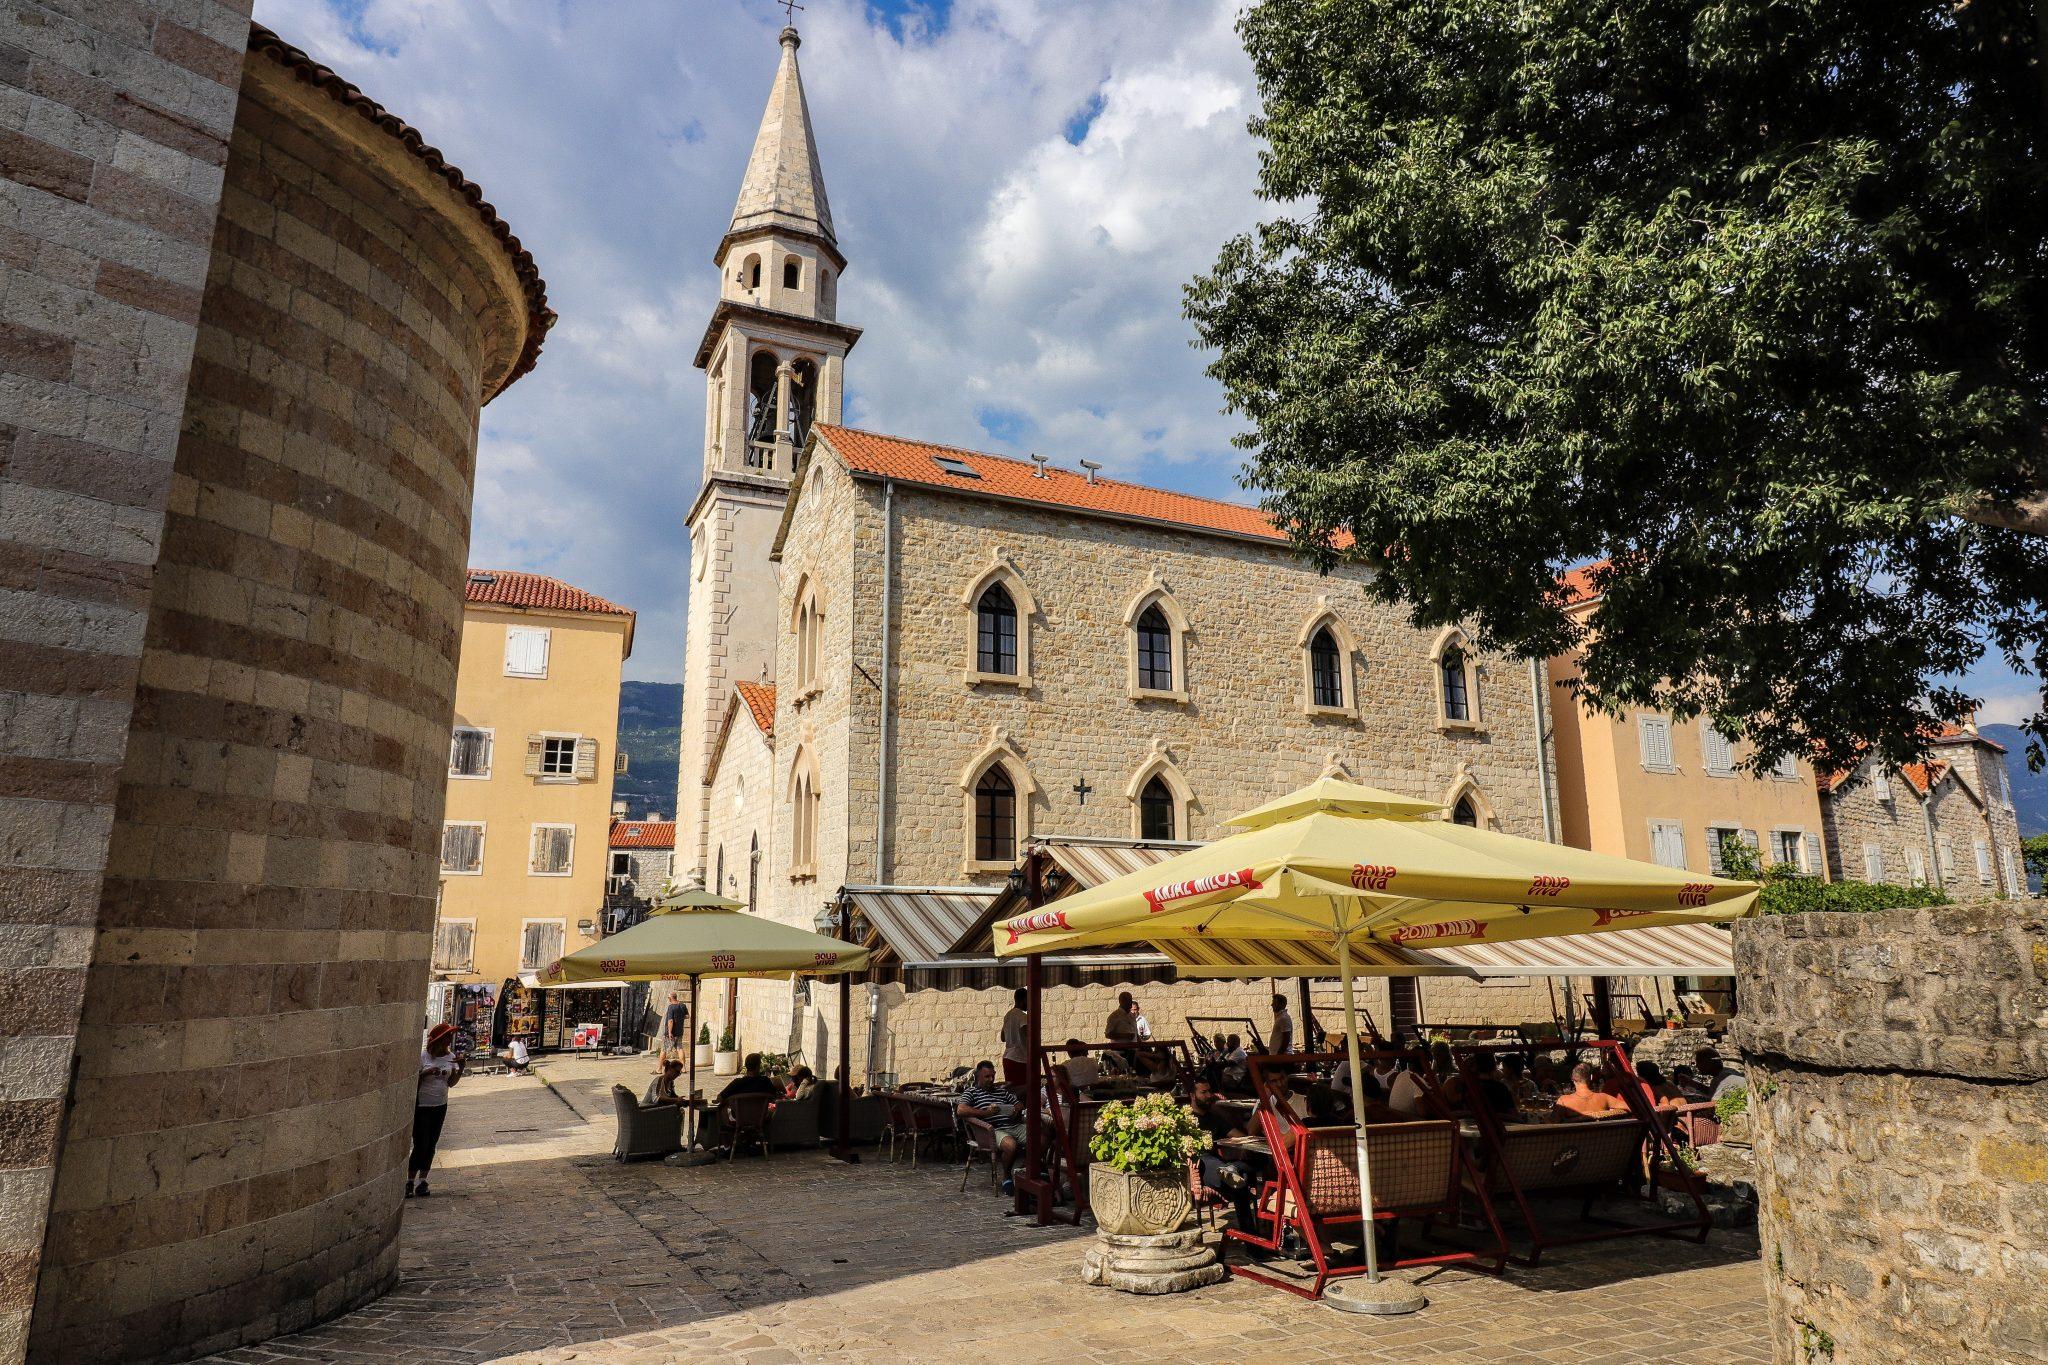 Church Old Town Budva, Montenegro